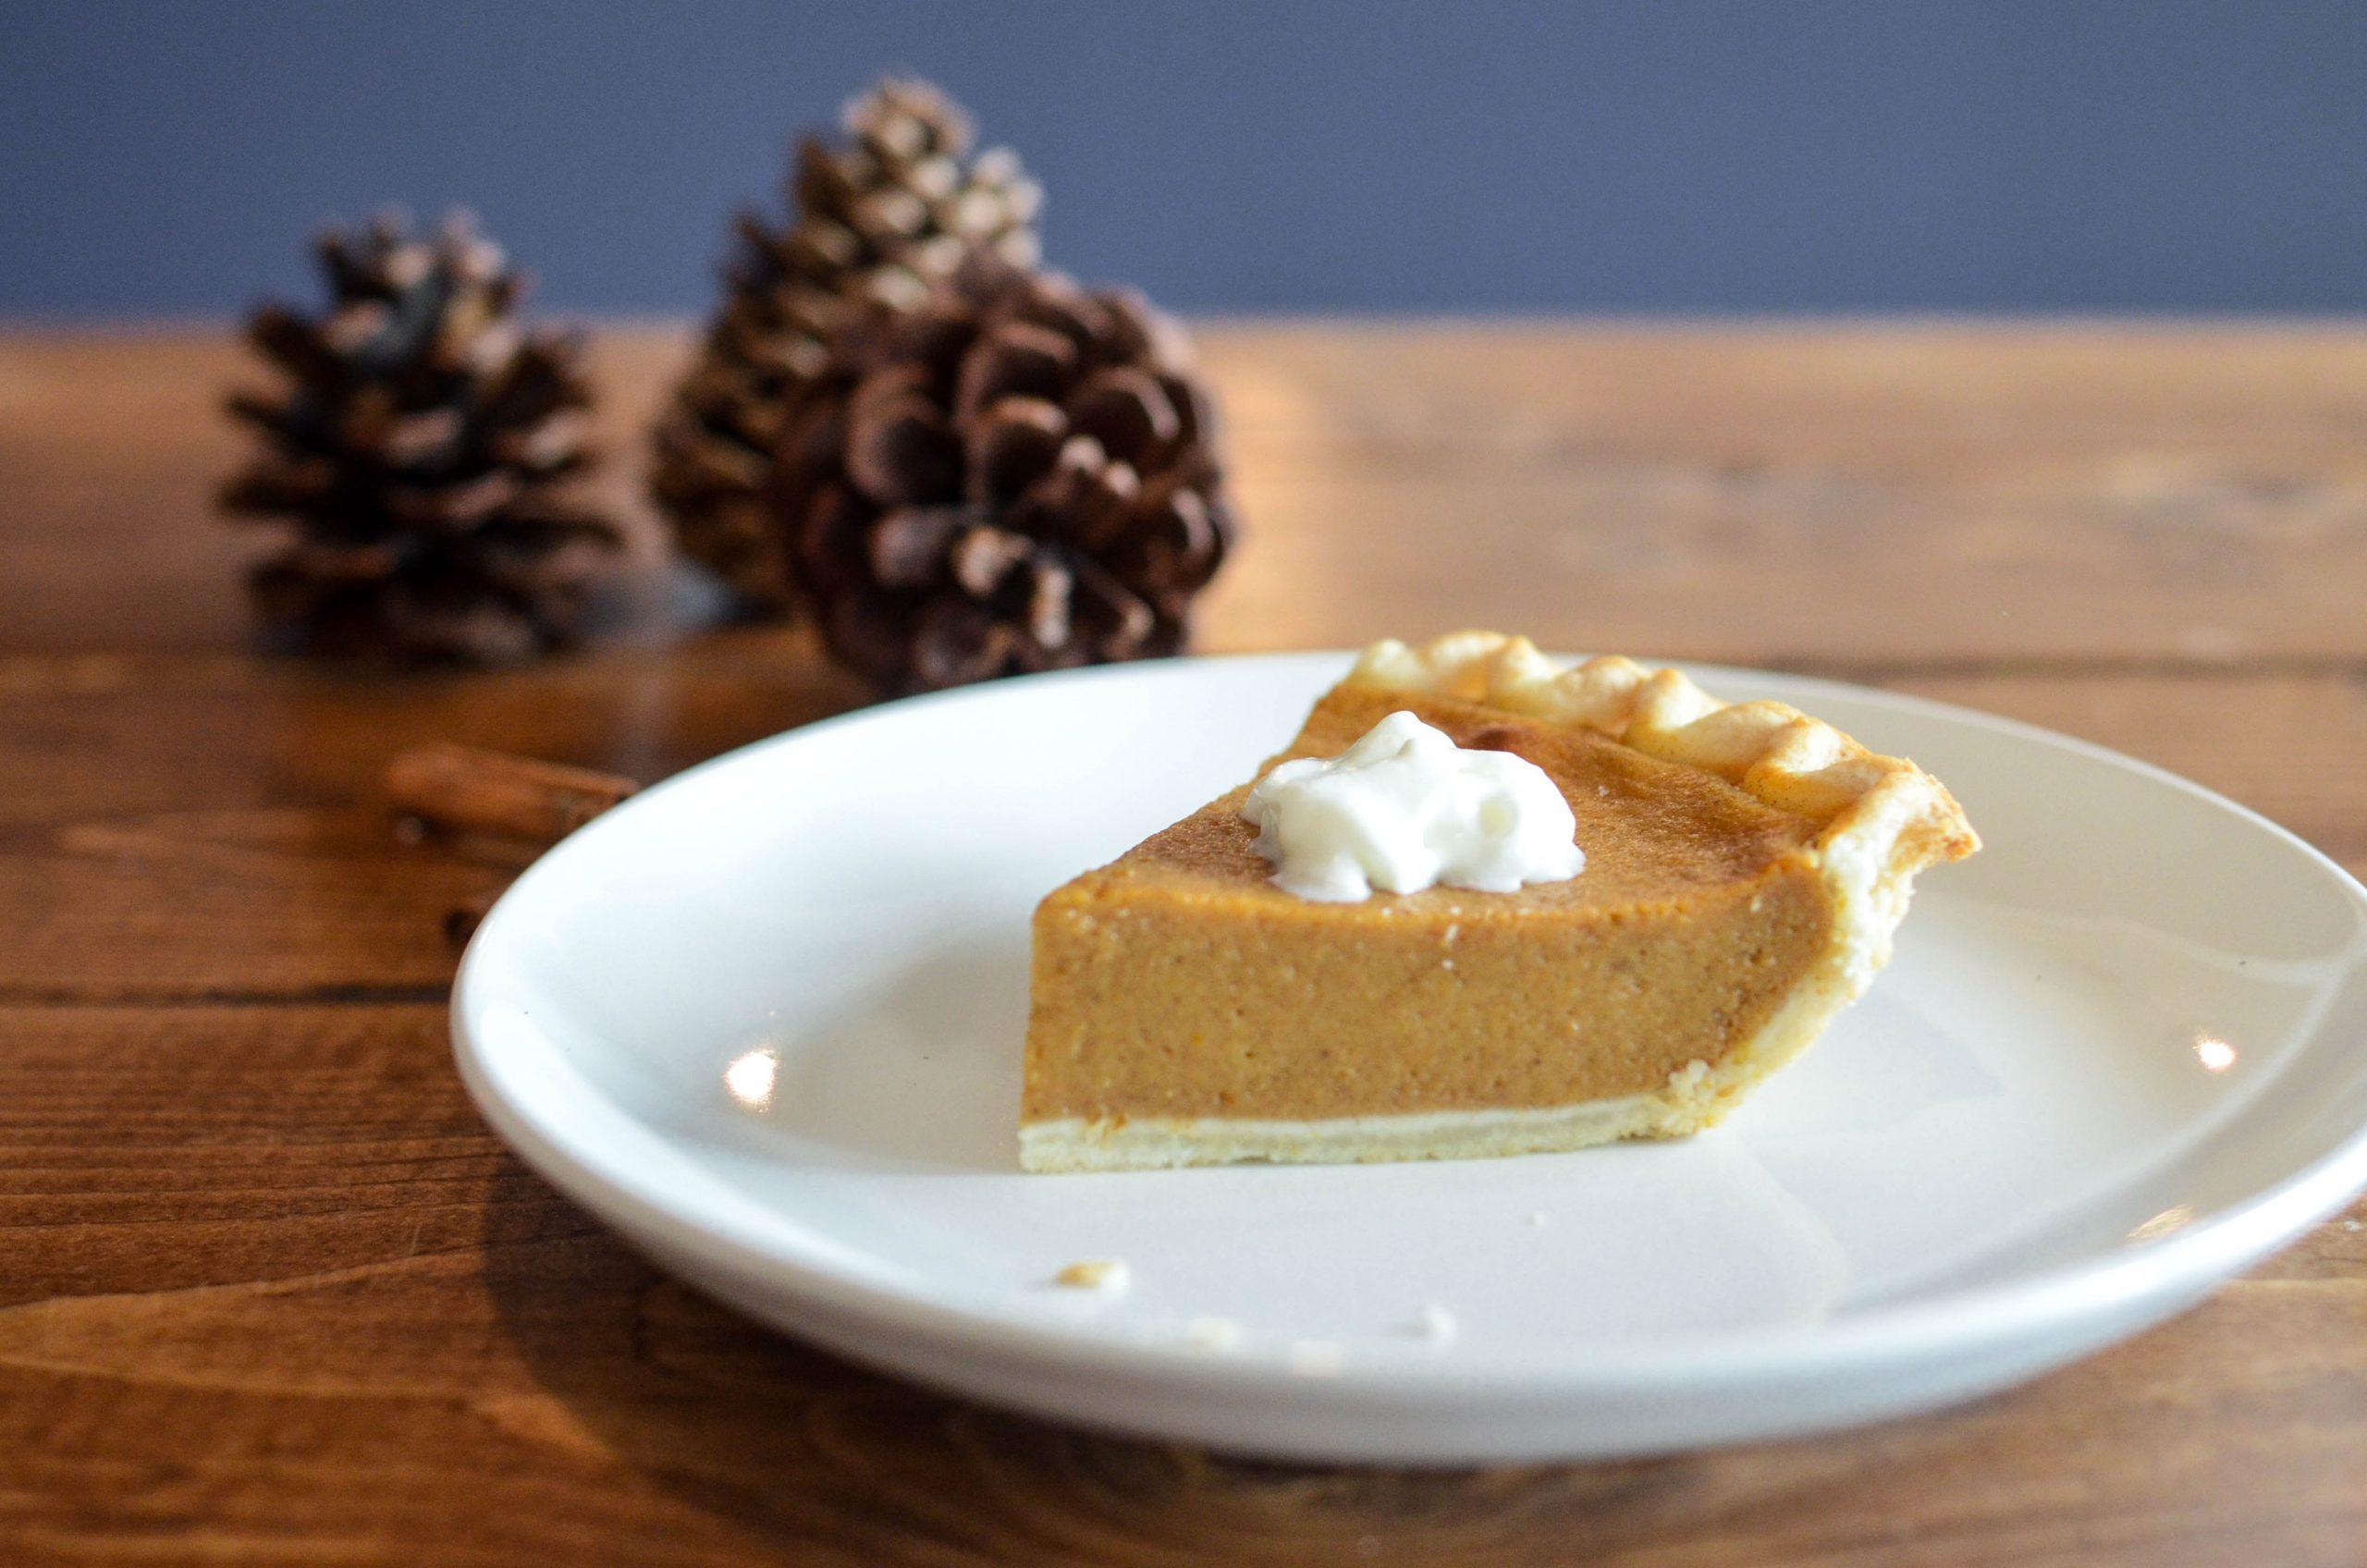 Pumpkin pie for dessert.